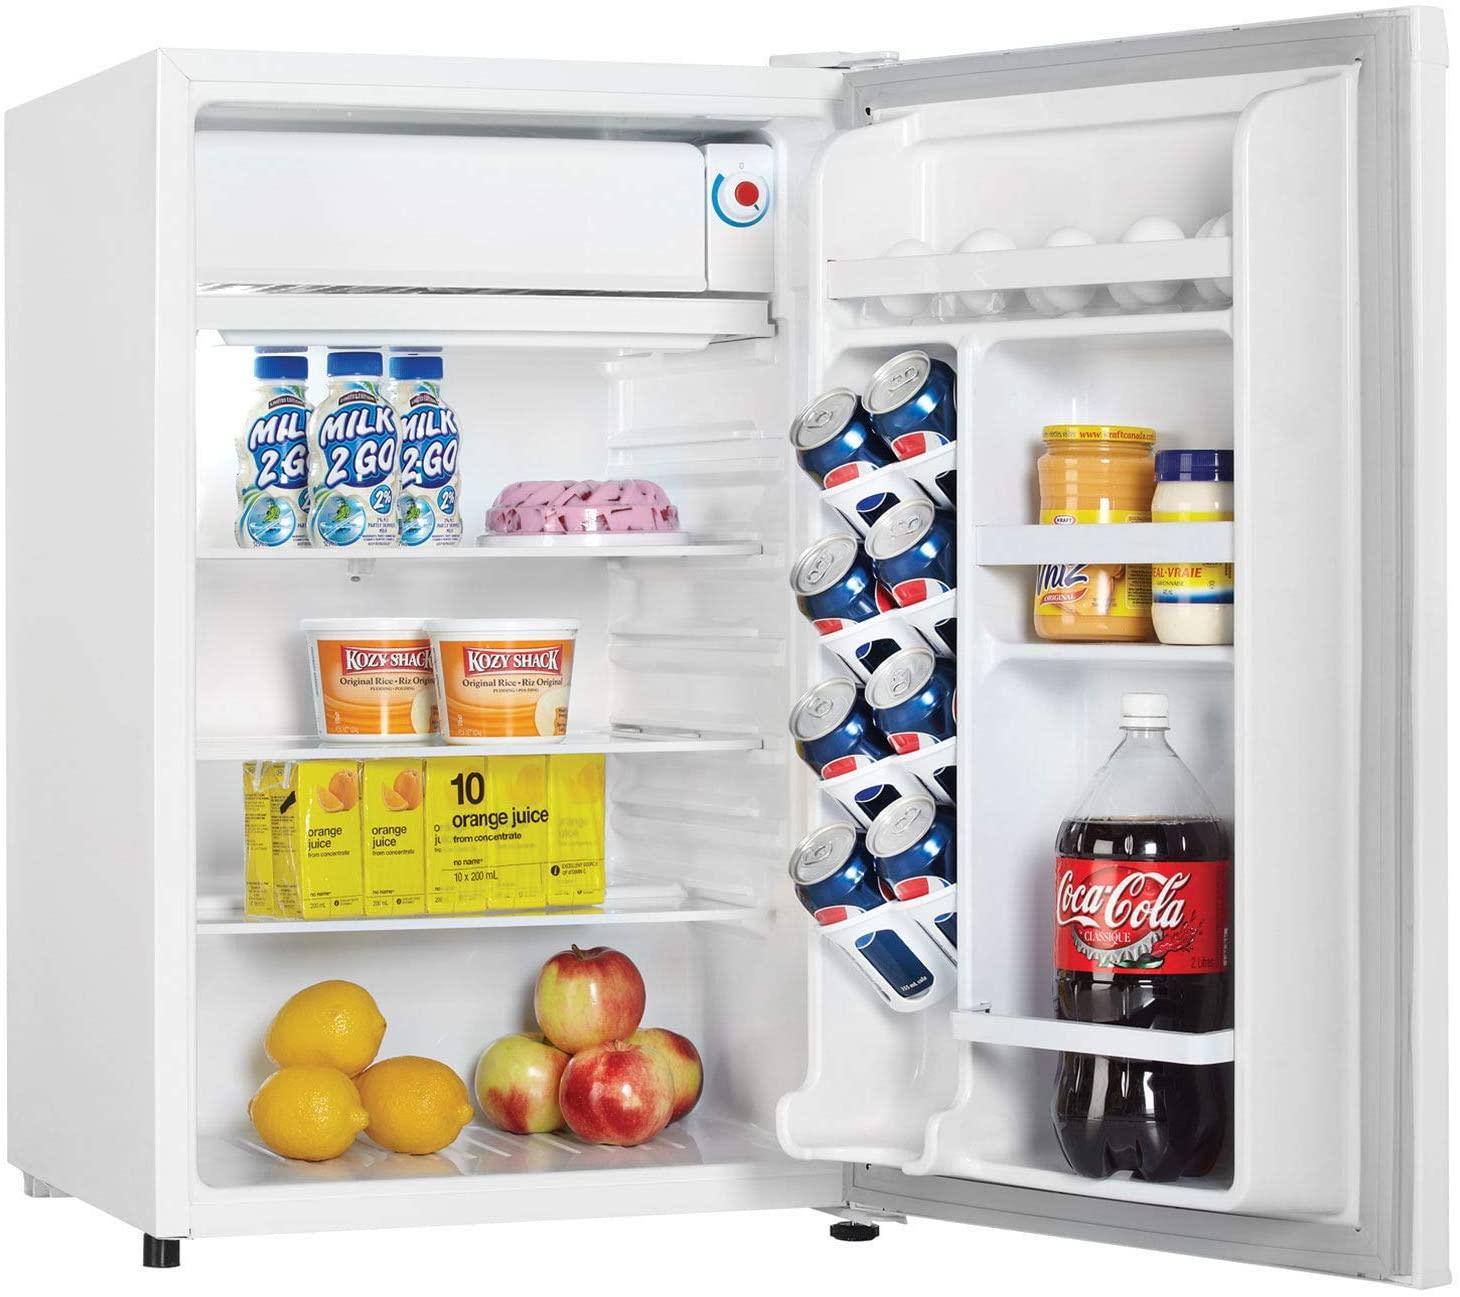 Danby 4.4 Cu. Ft. Compact Refrigerator, White